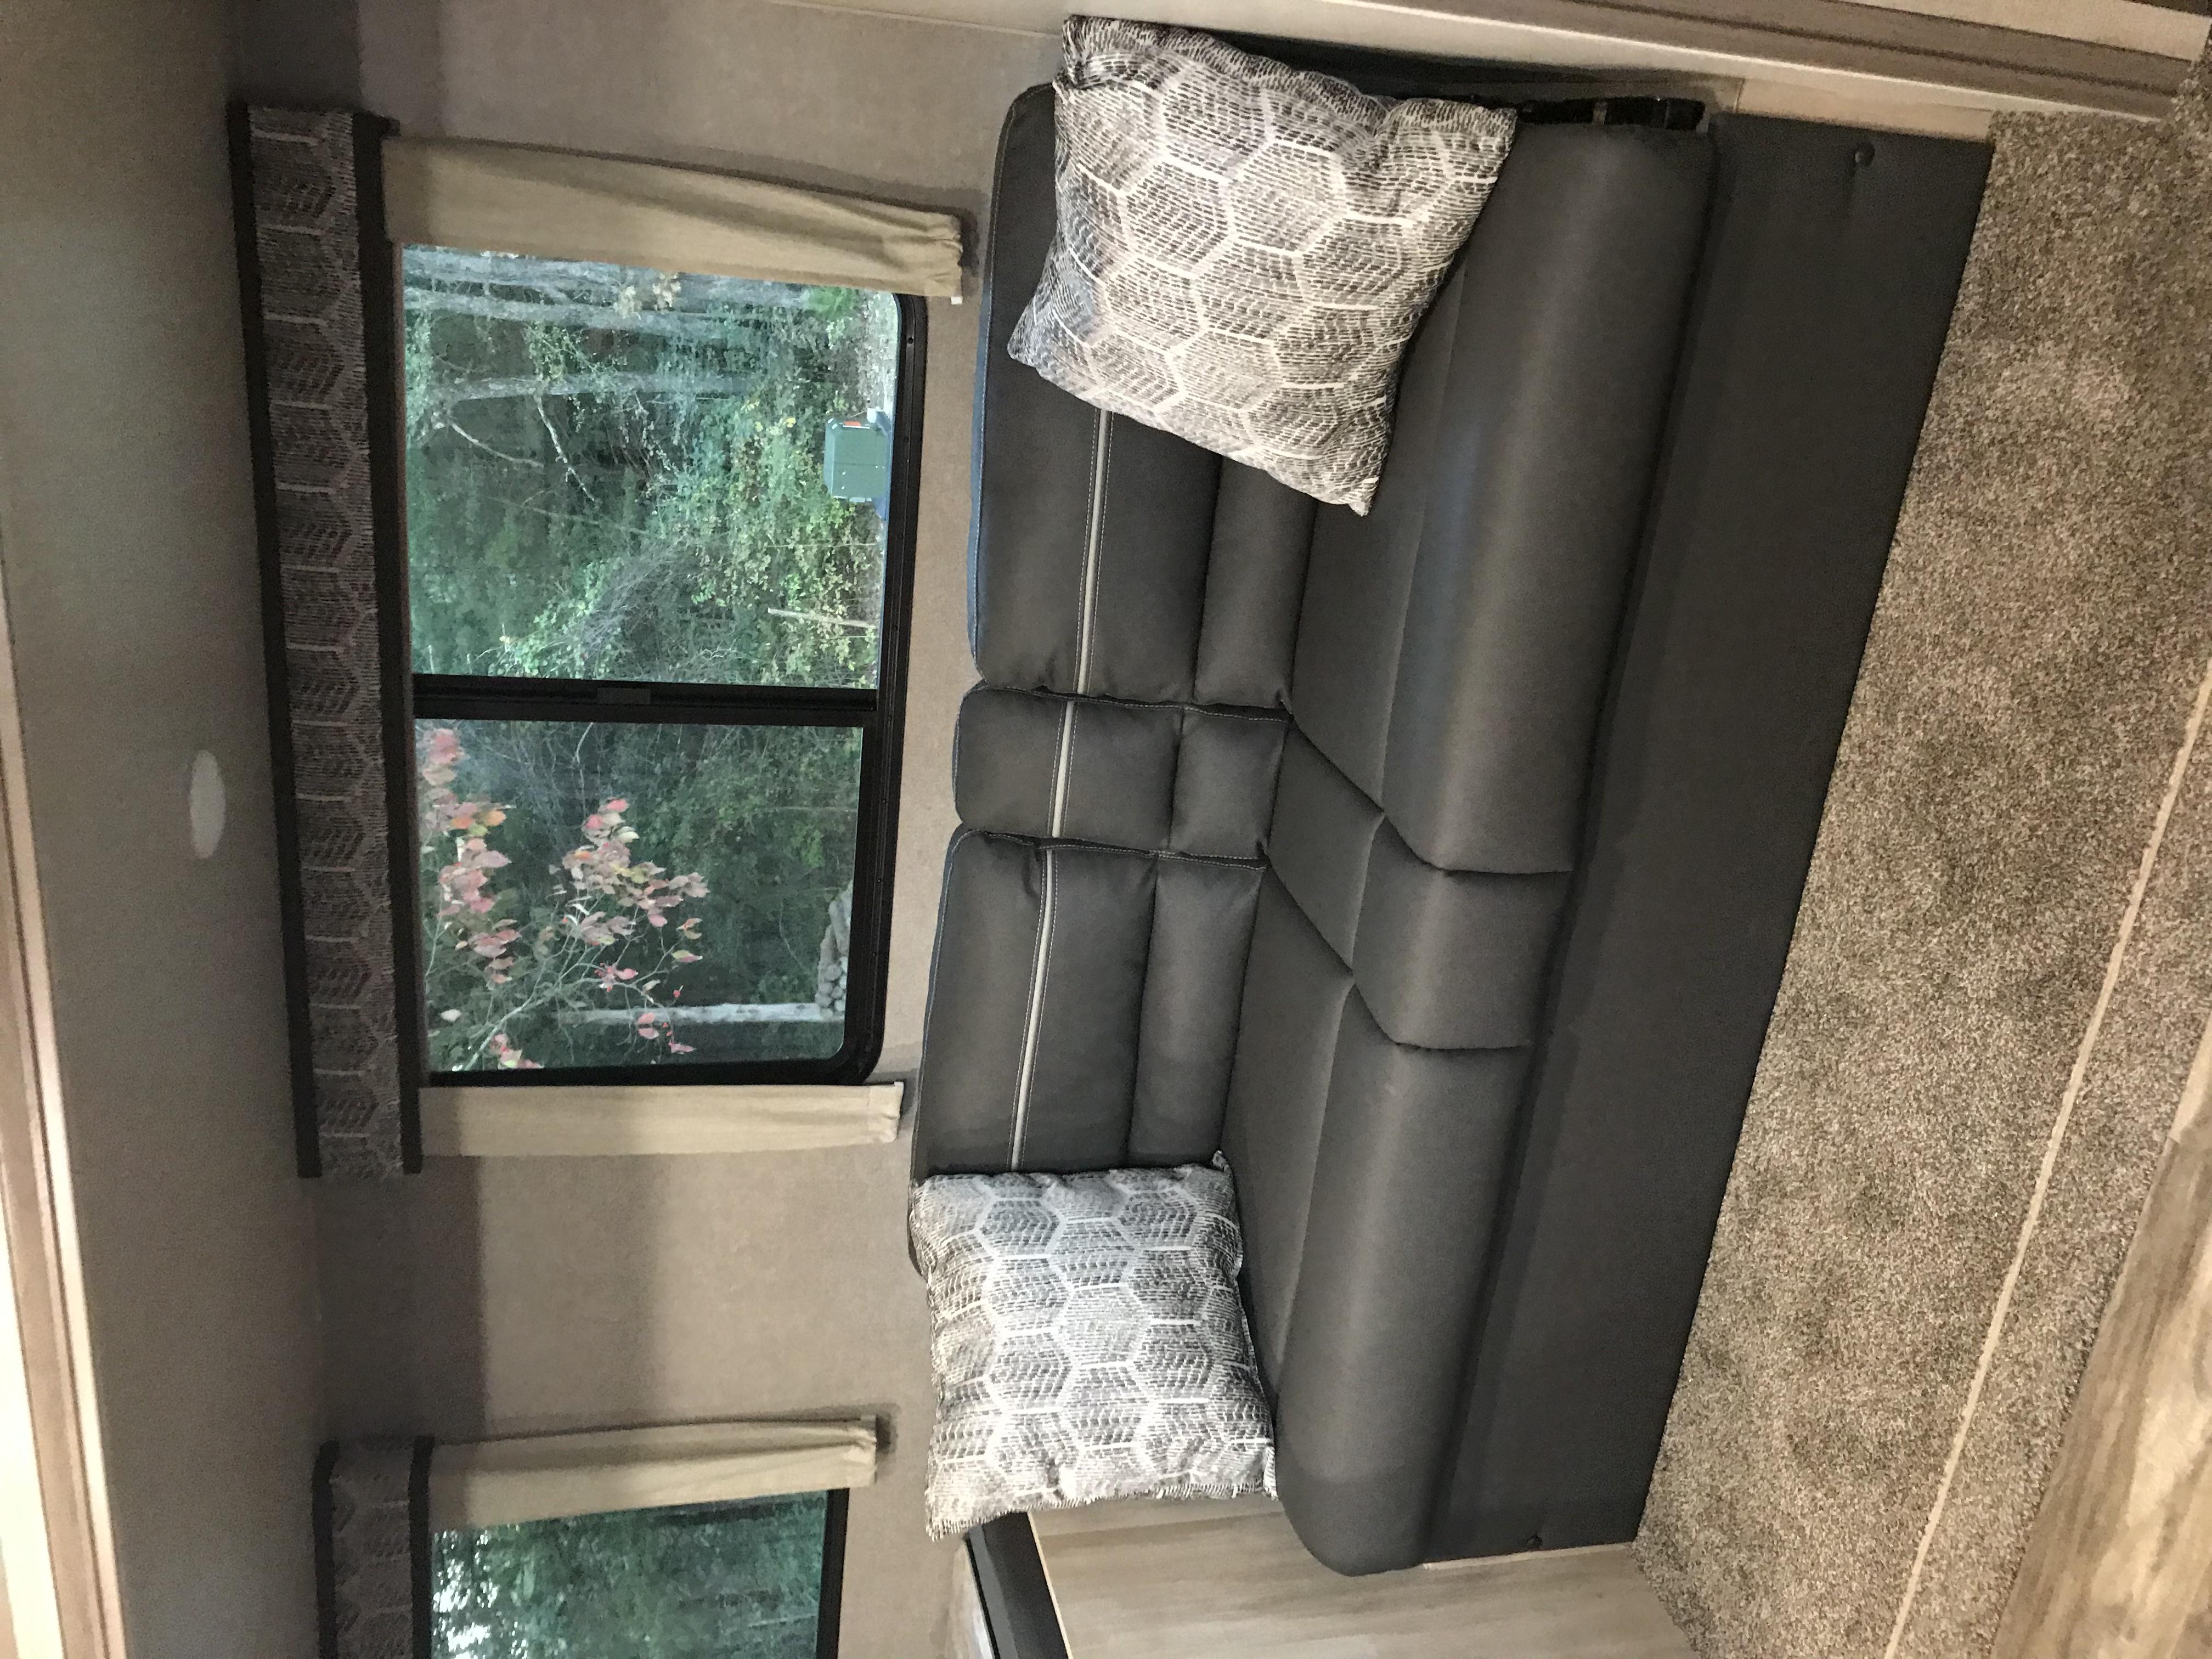 Couch. Coachmen Catalina 2020